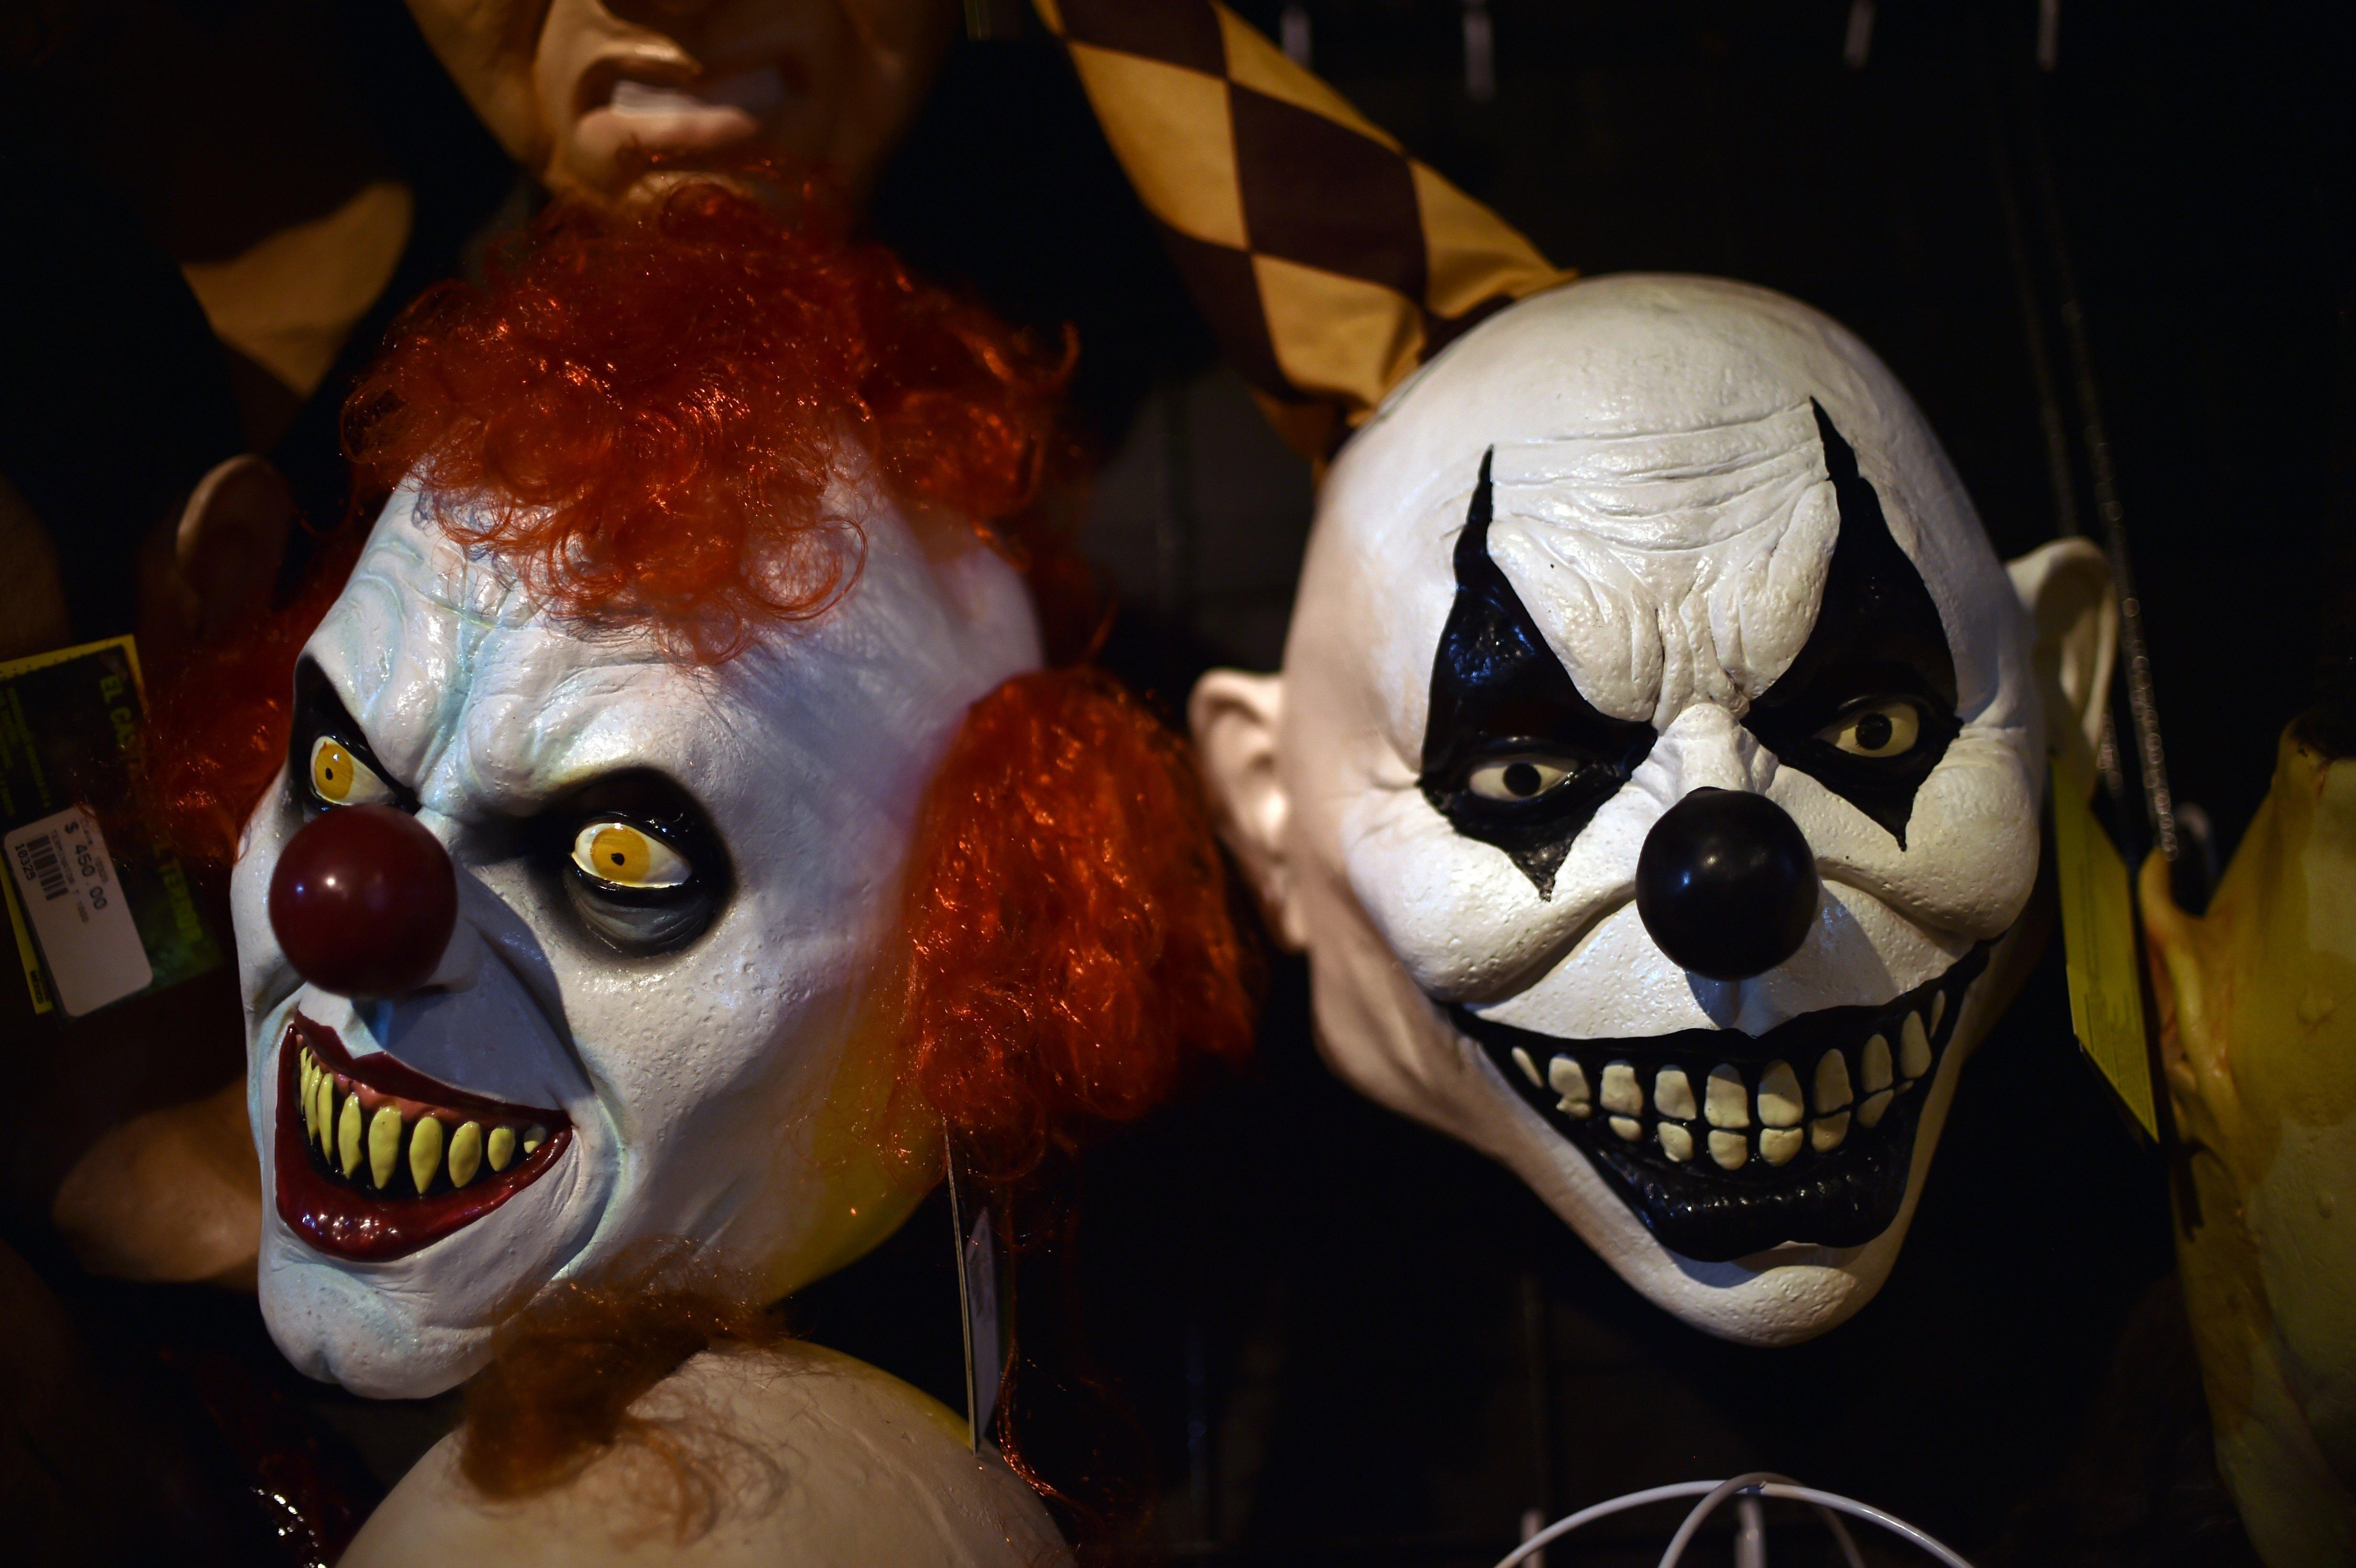 killer clown craze fears